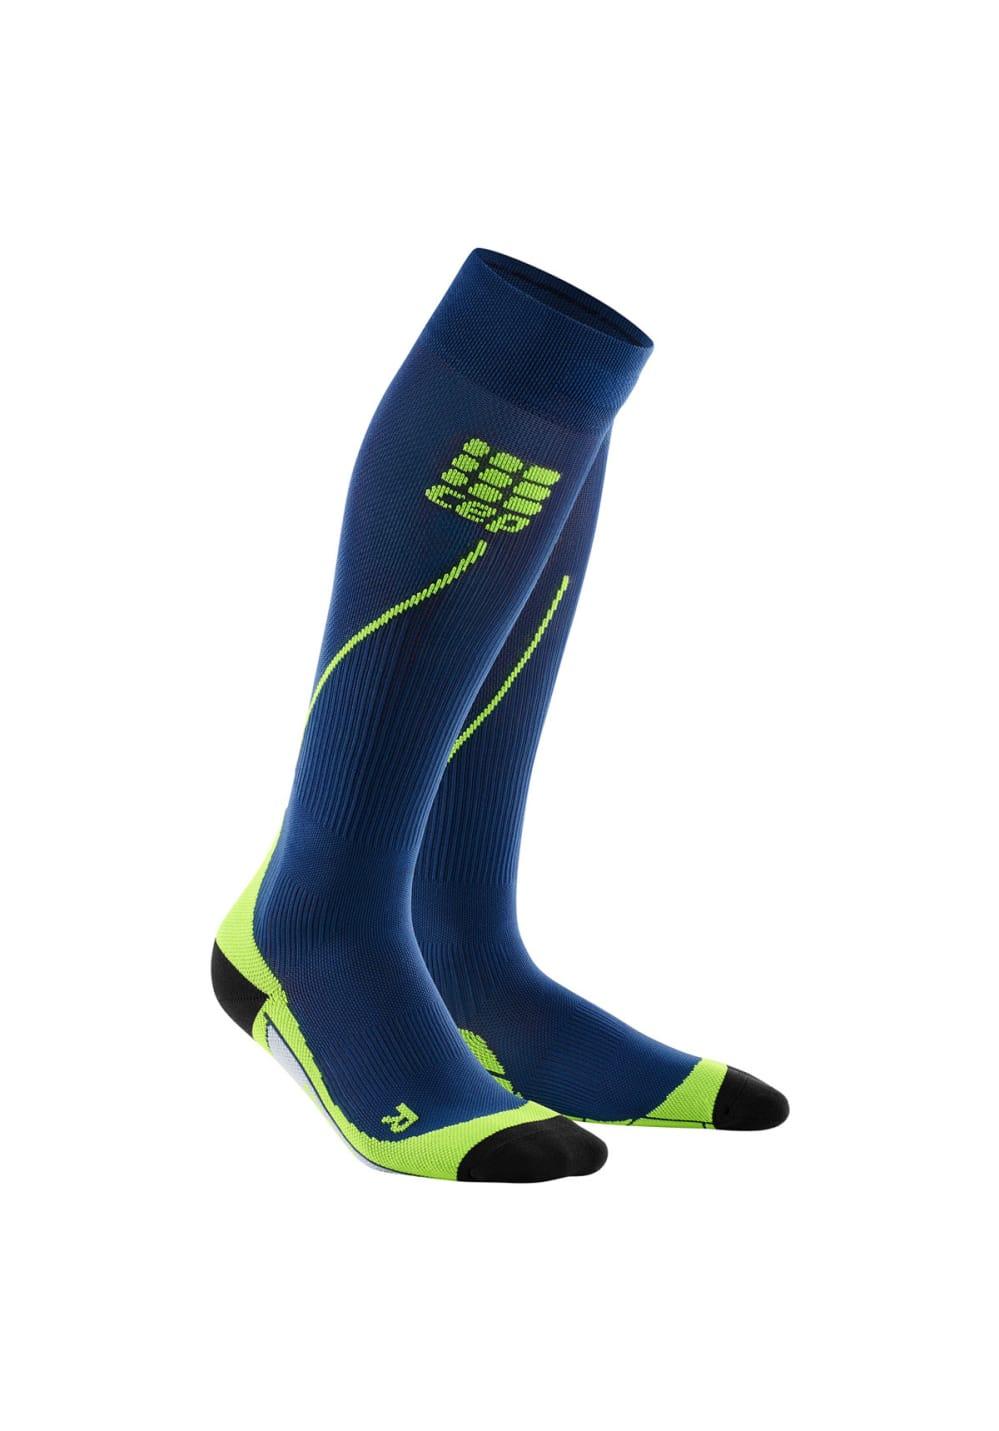 CEP Pro+ Run Socks 2.0 - Laufsocken für Damen - Blau